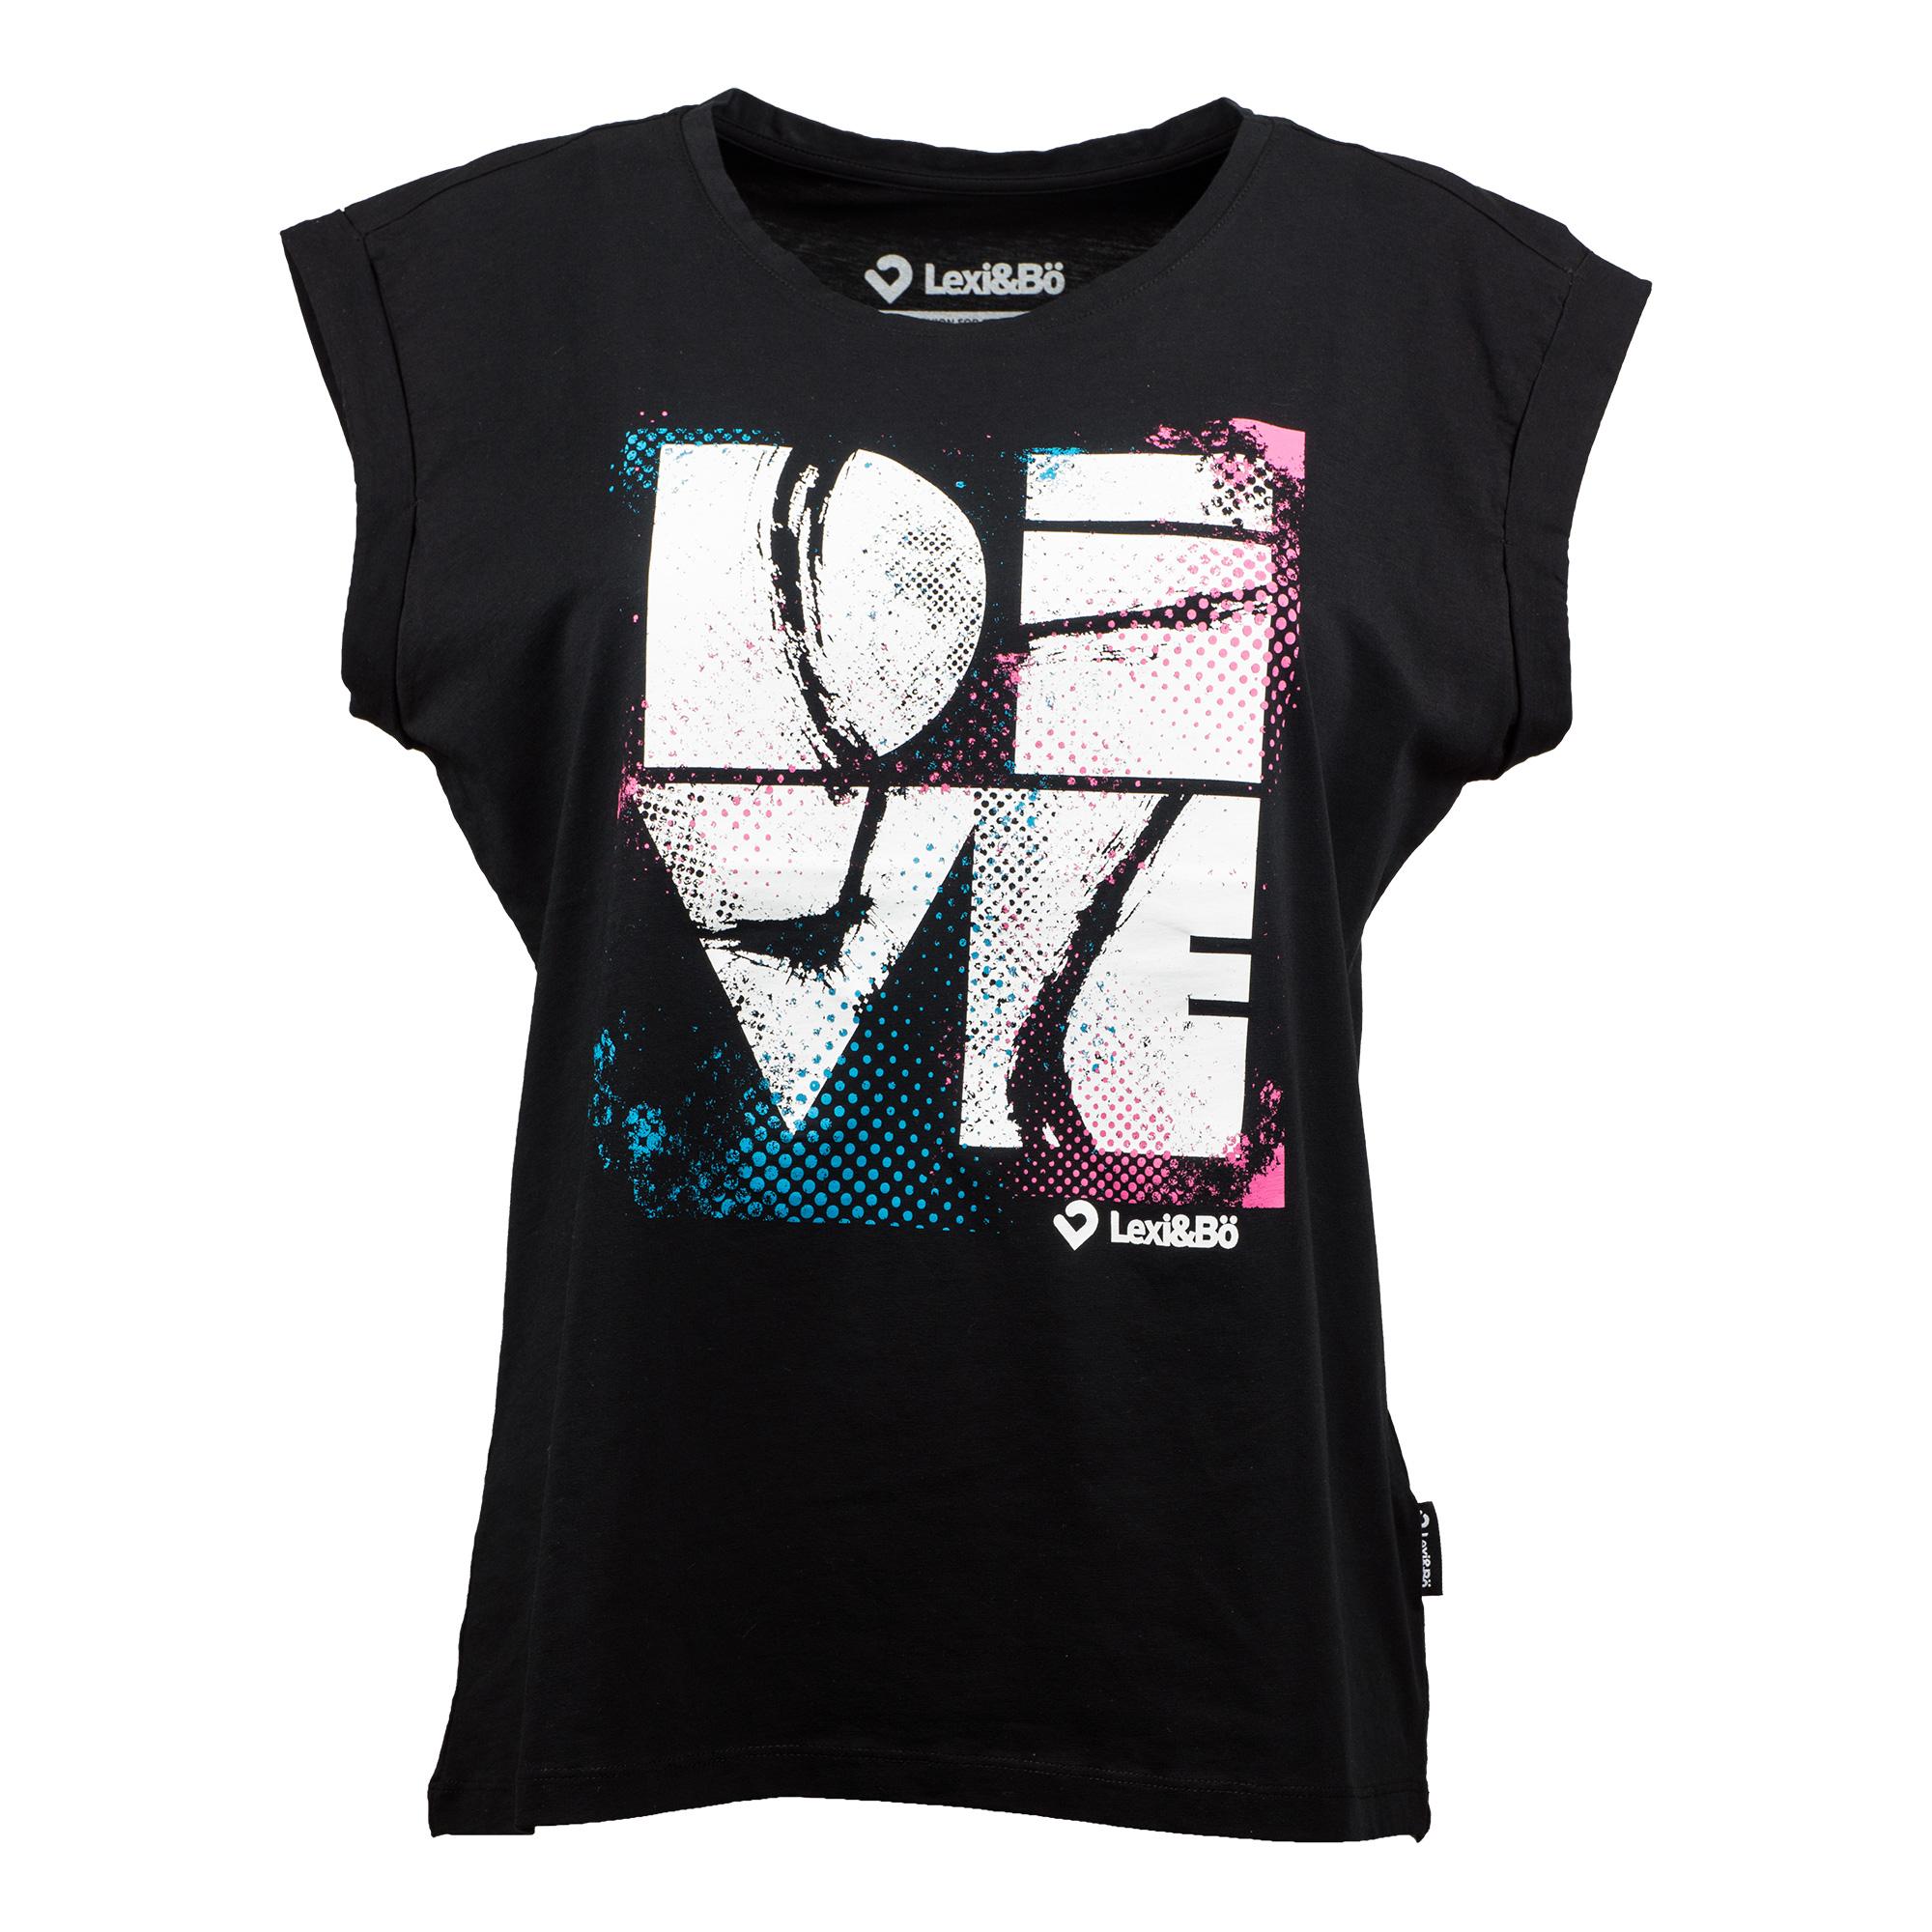 f21b3eaf1 ... Preview: DIVE T-shirt women. Dive Damen Beach Cut black mit großem  Frontprint - Vorderansicht